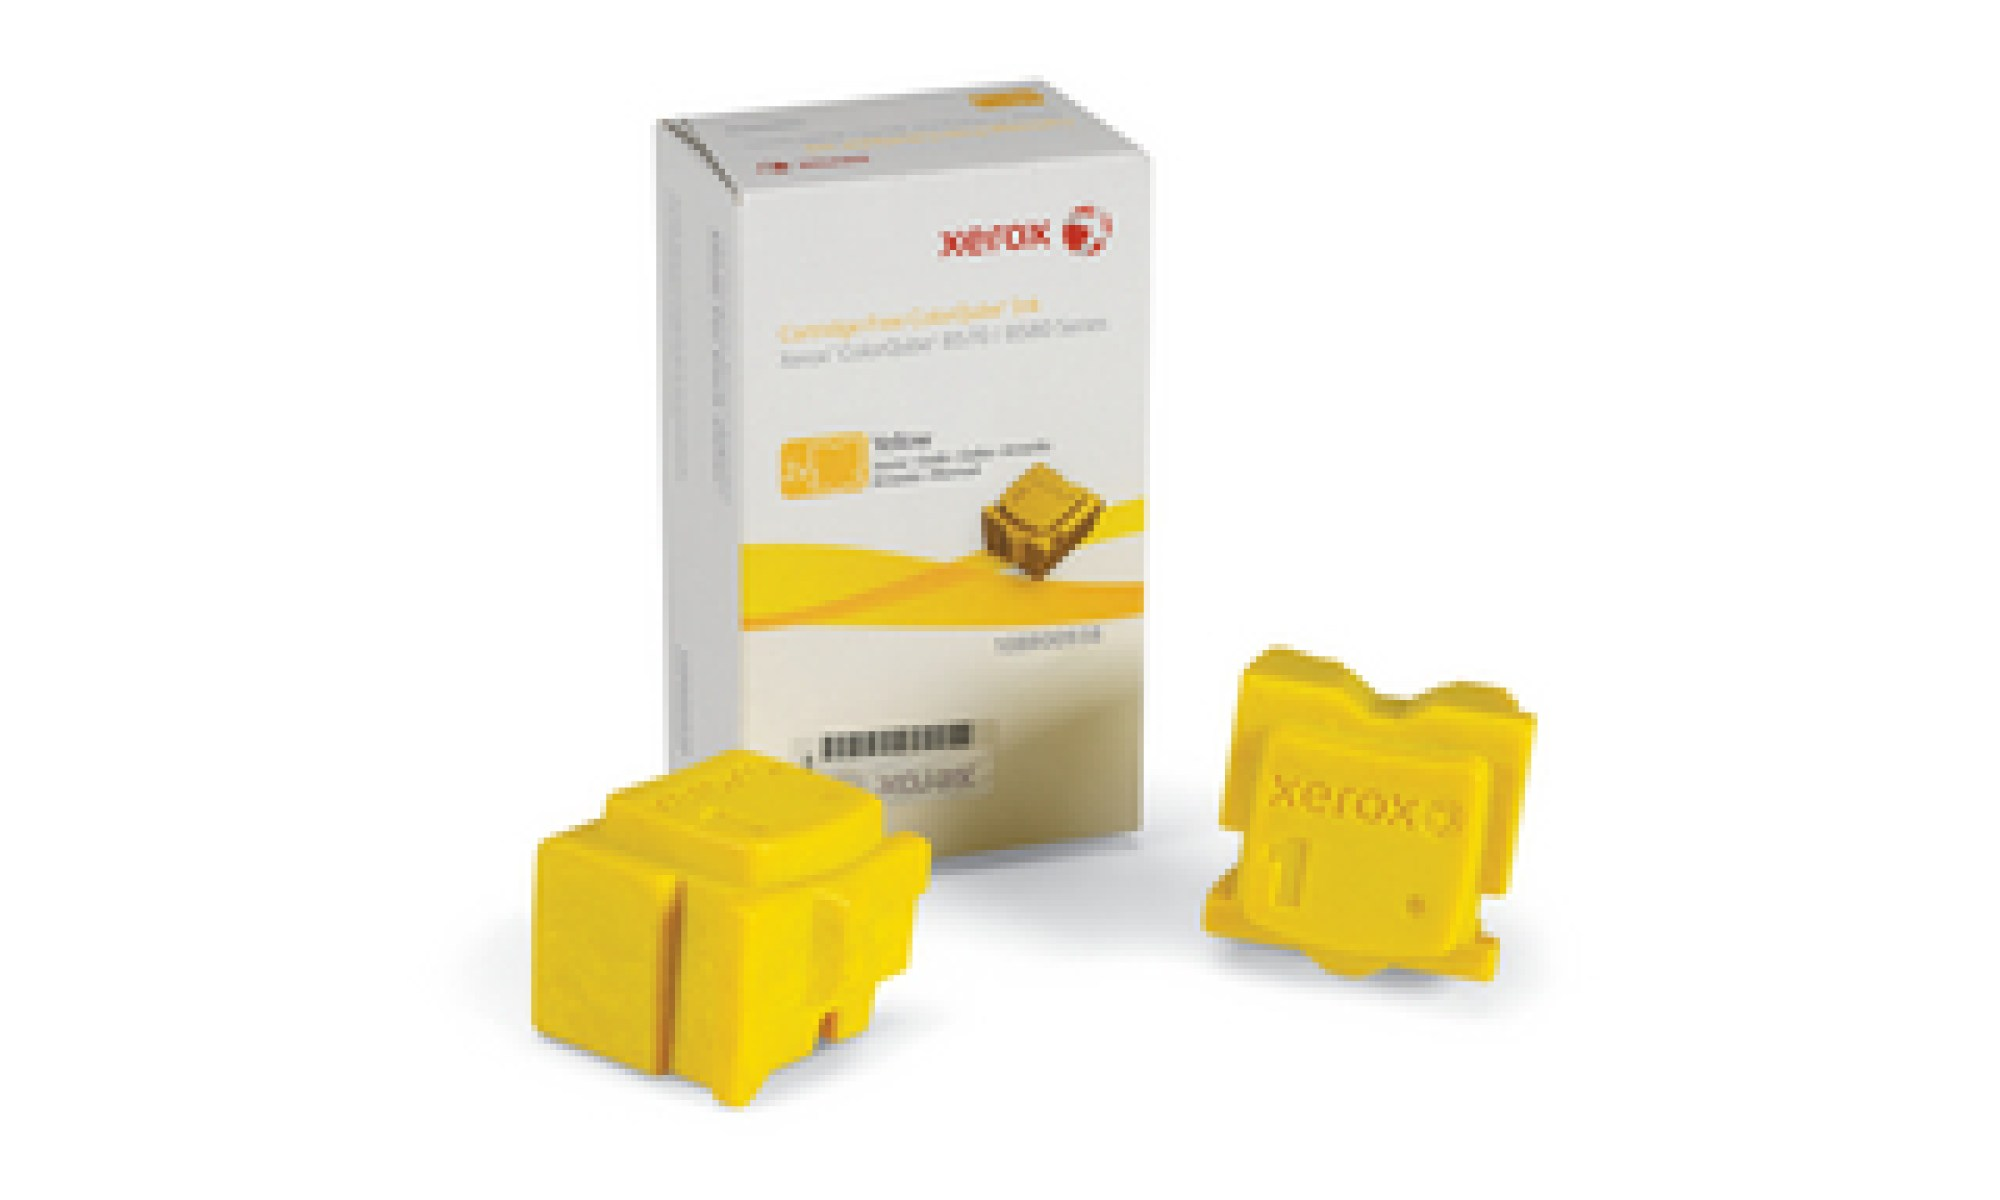 108R00938 Cerneala solida yellow pentru ColorQube 8570, 8580, 8870, 8880